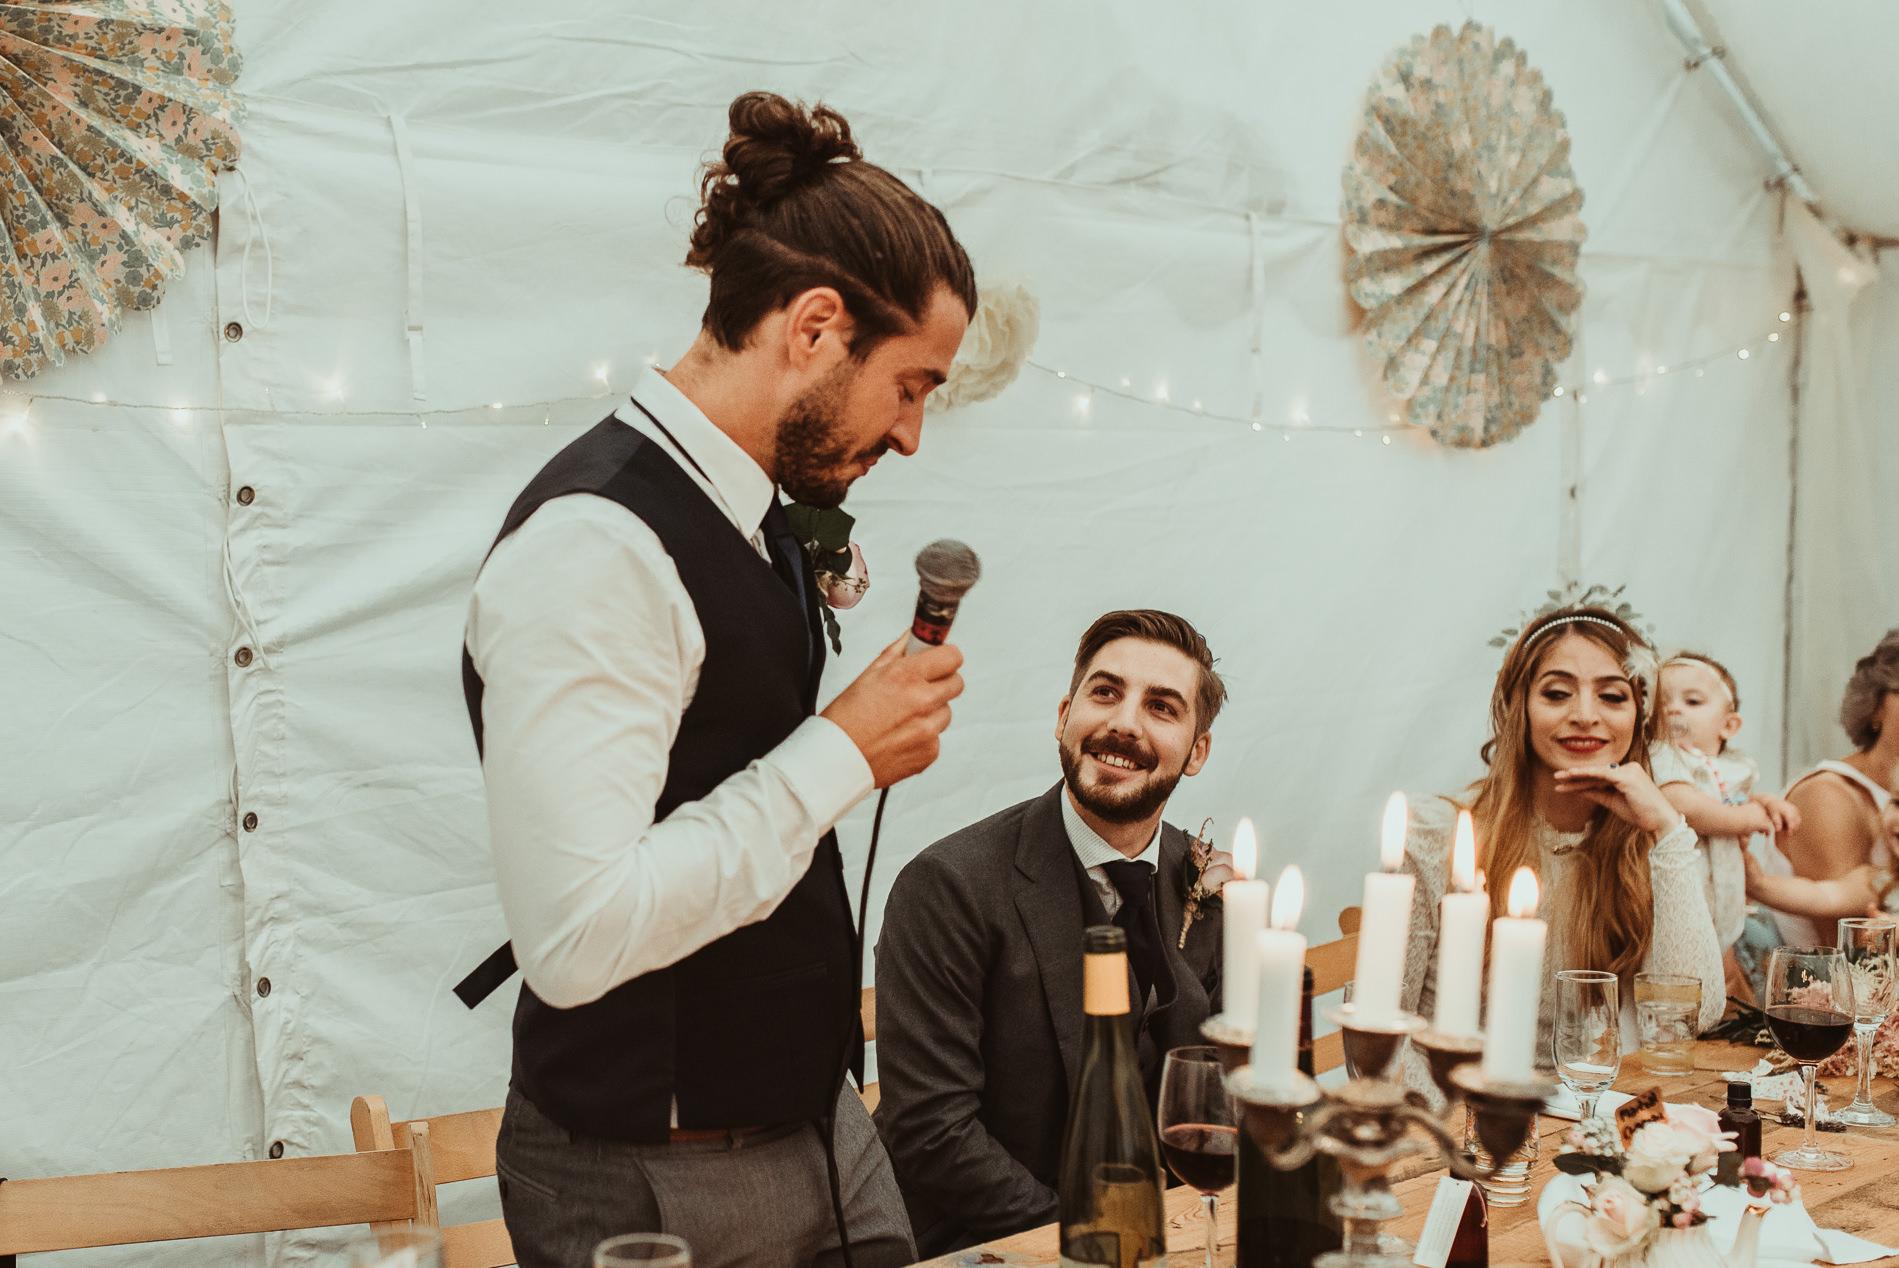 bohemian_wedding_lawshall_church_garden116